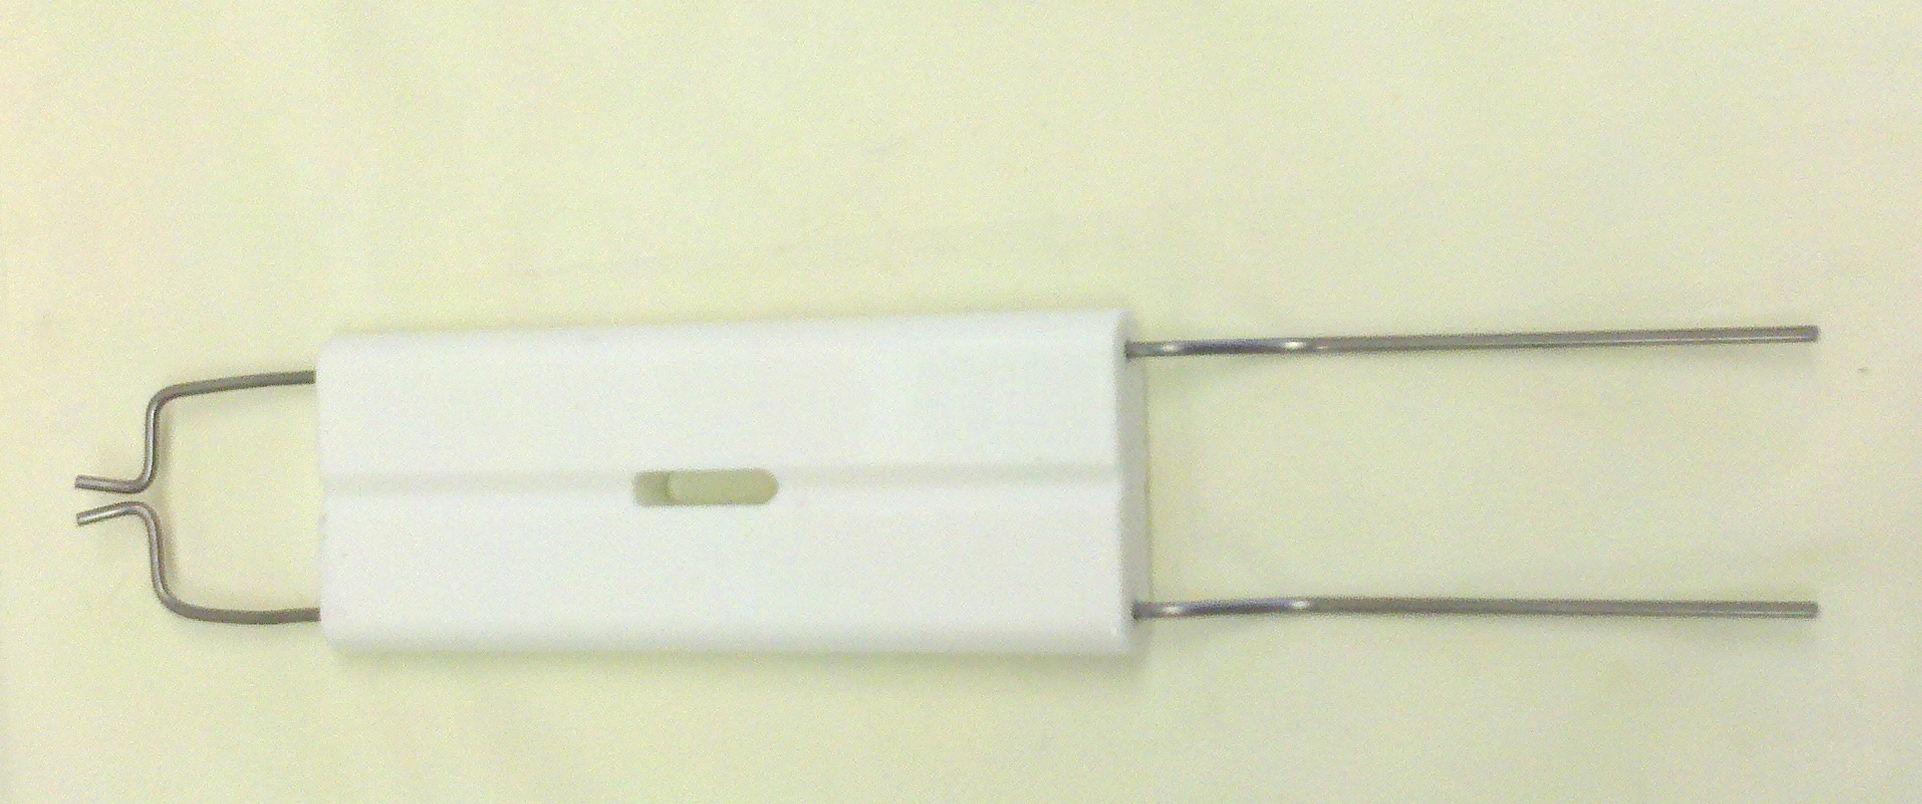 3729 Lanair Electrode Electrodes, Oil furnace, Towel rack